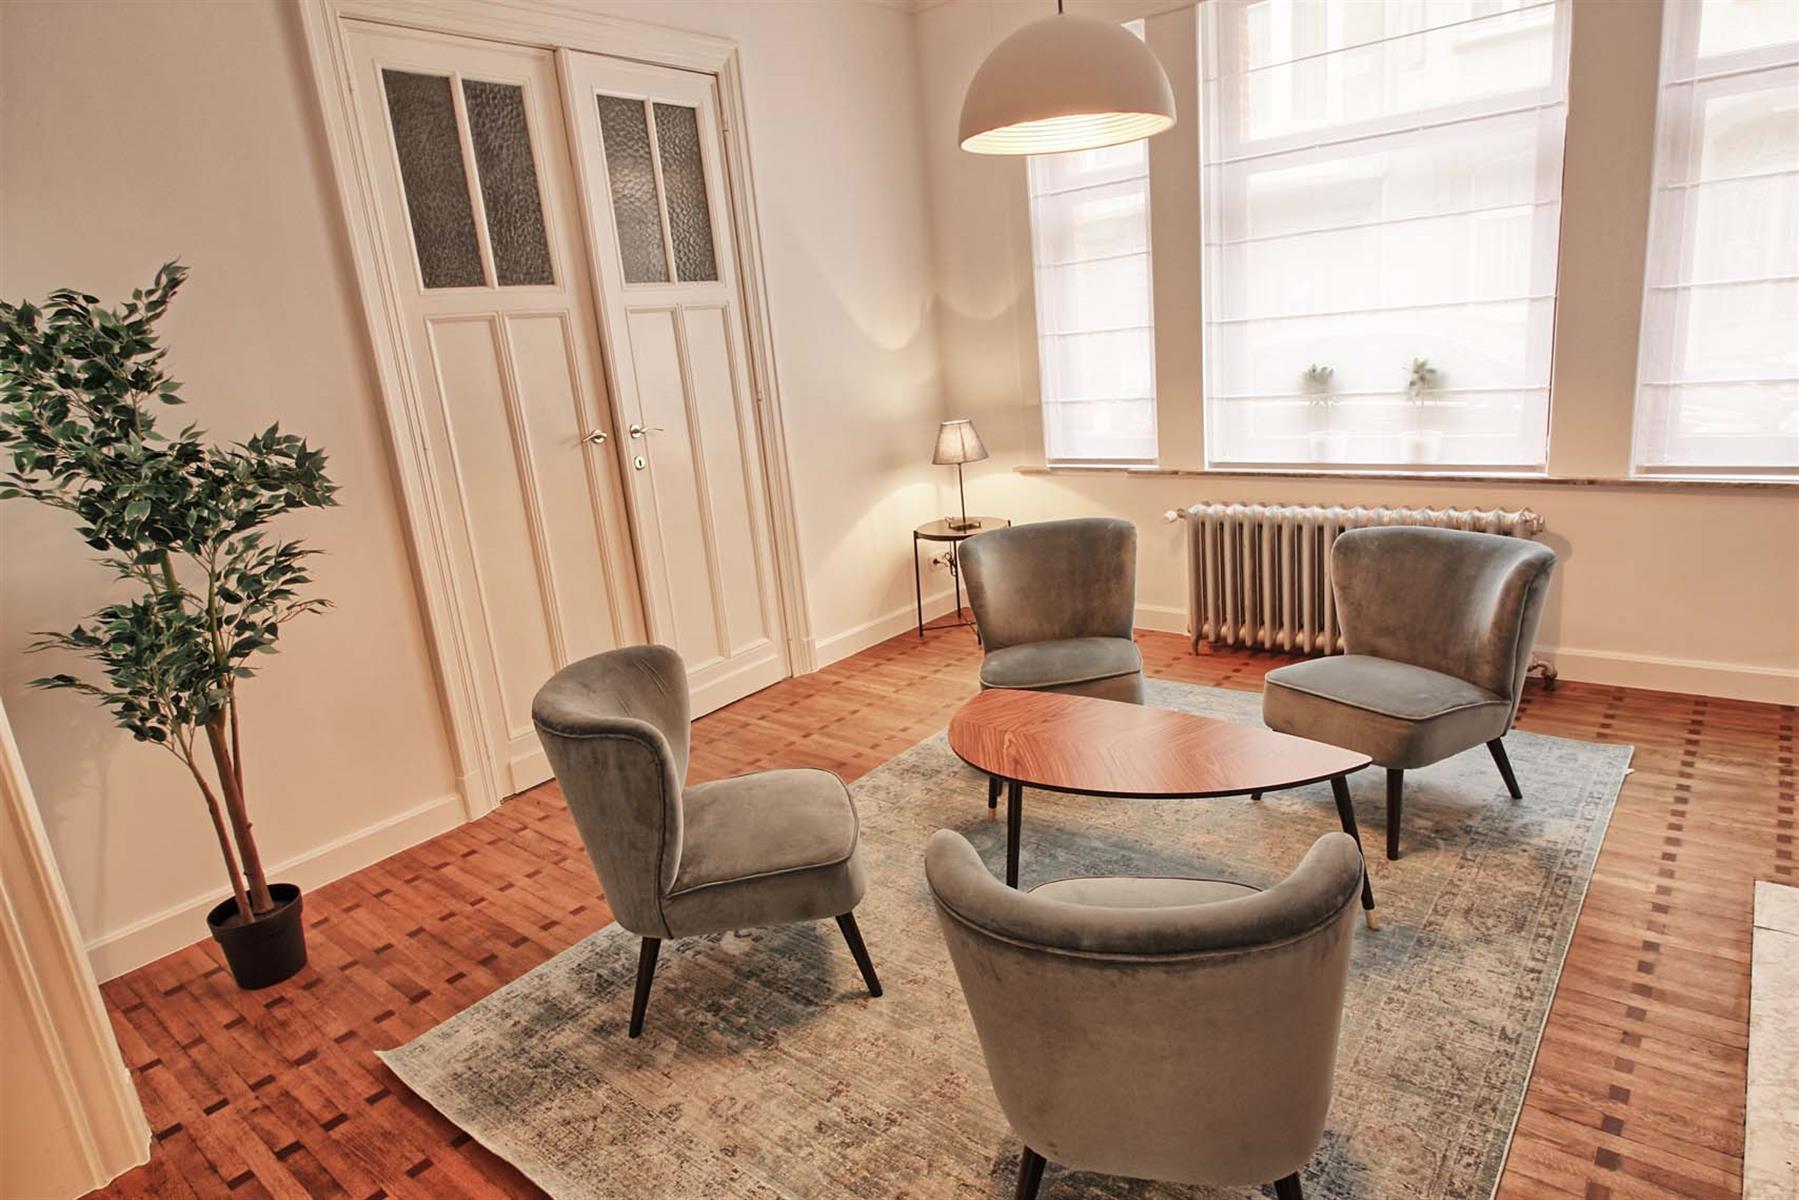 Maison - Ixelles - #4106764-2